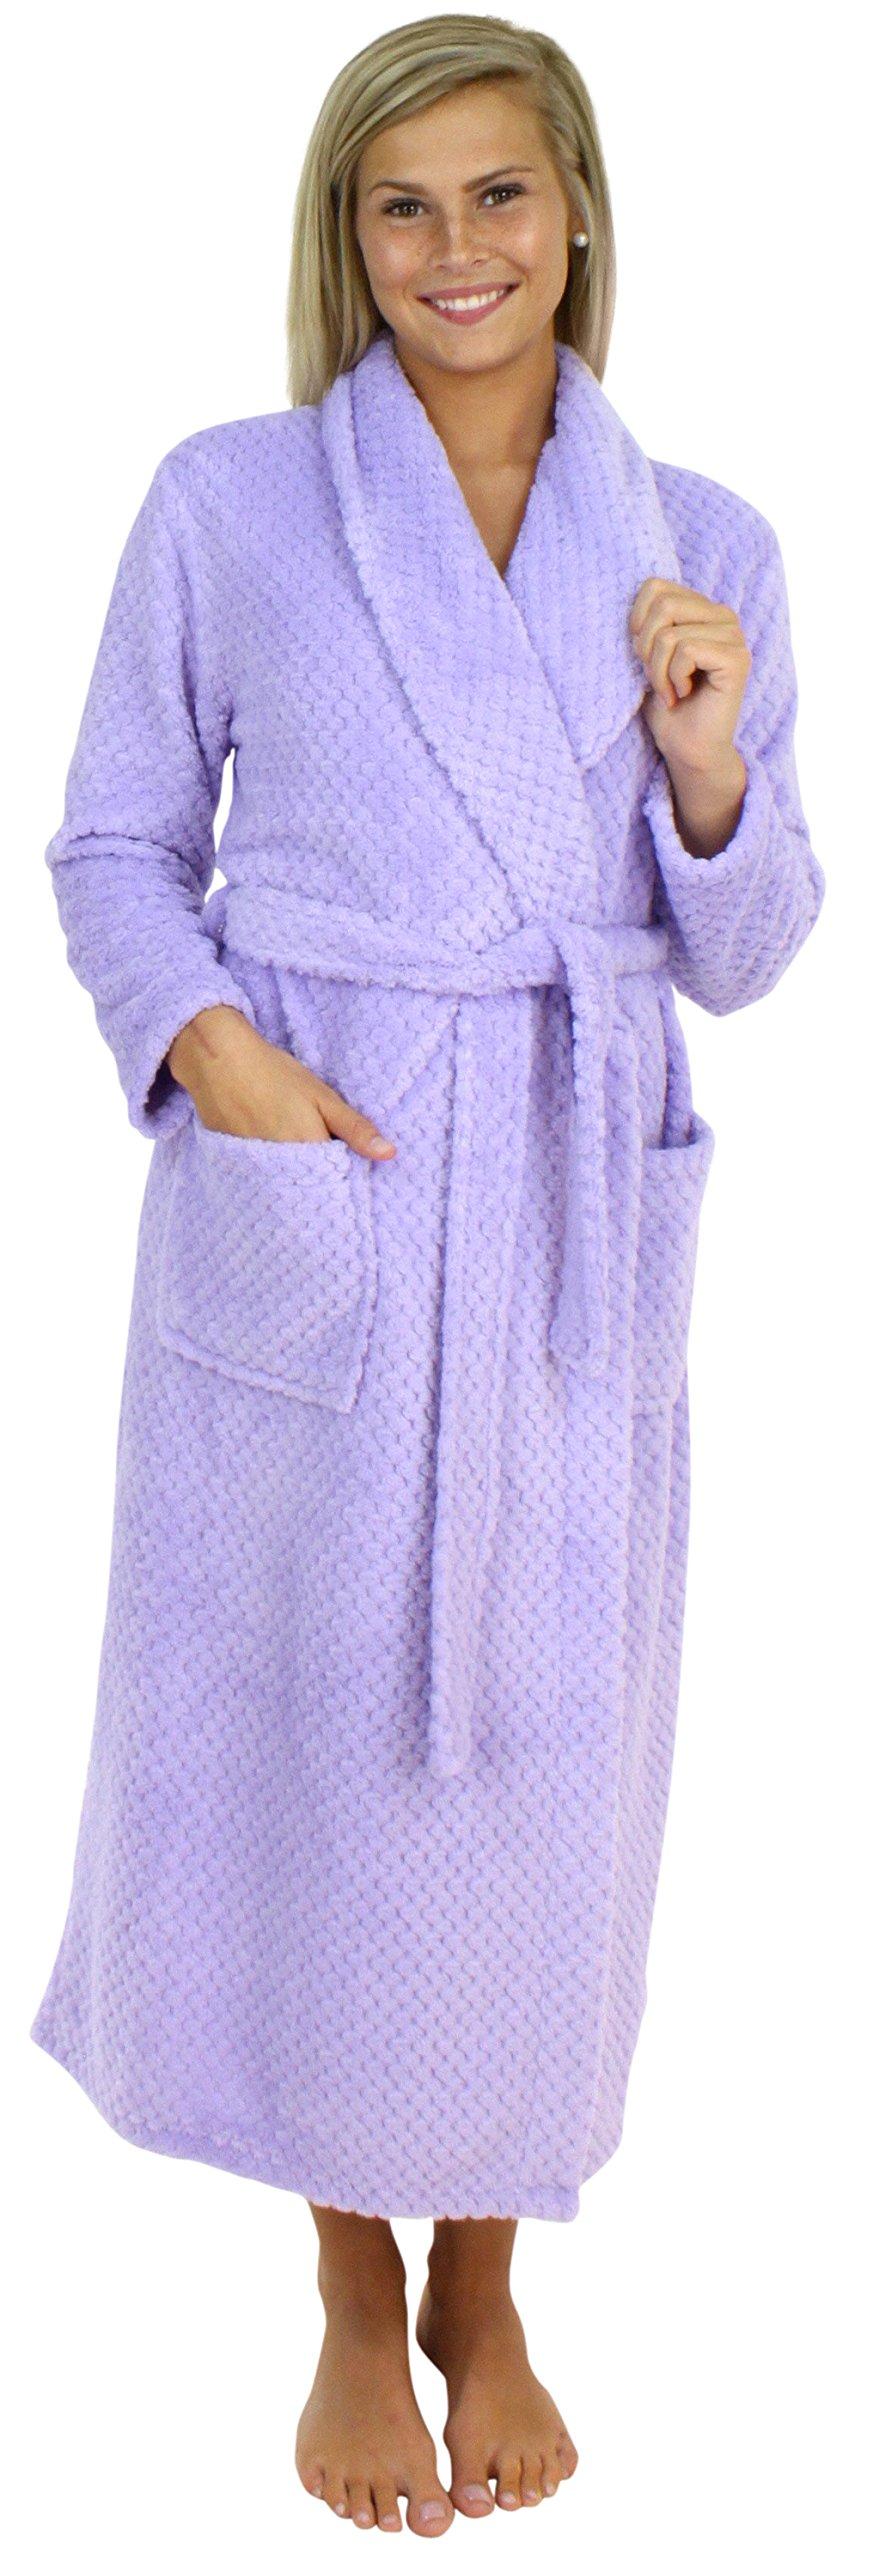 Sleepyheads Bata Larga Guateada de vellón Mullido para Mujer product image